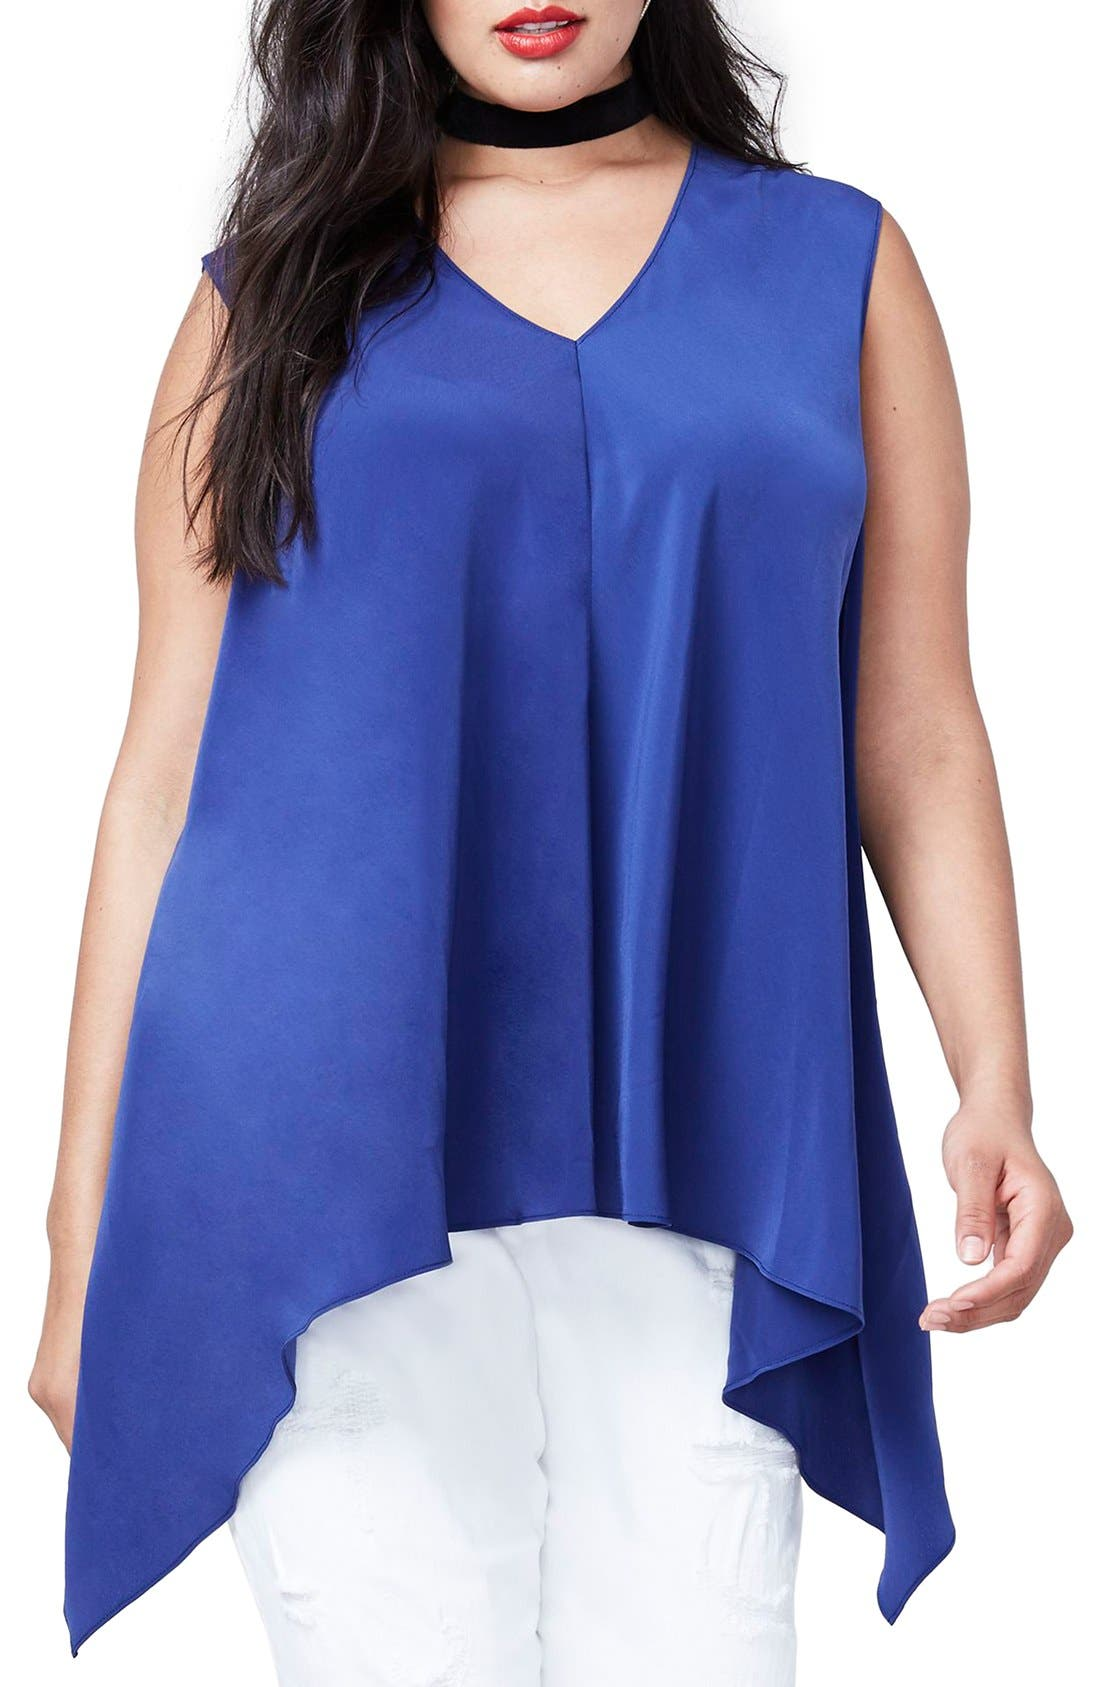 Alternate Image 1 Selected - RACHEL Rachel Roy Side Drape Top (Plus Size)